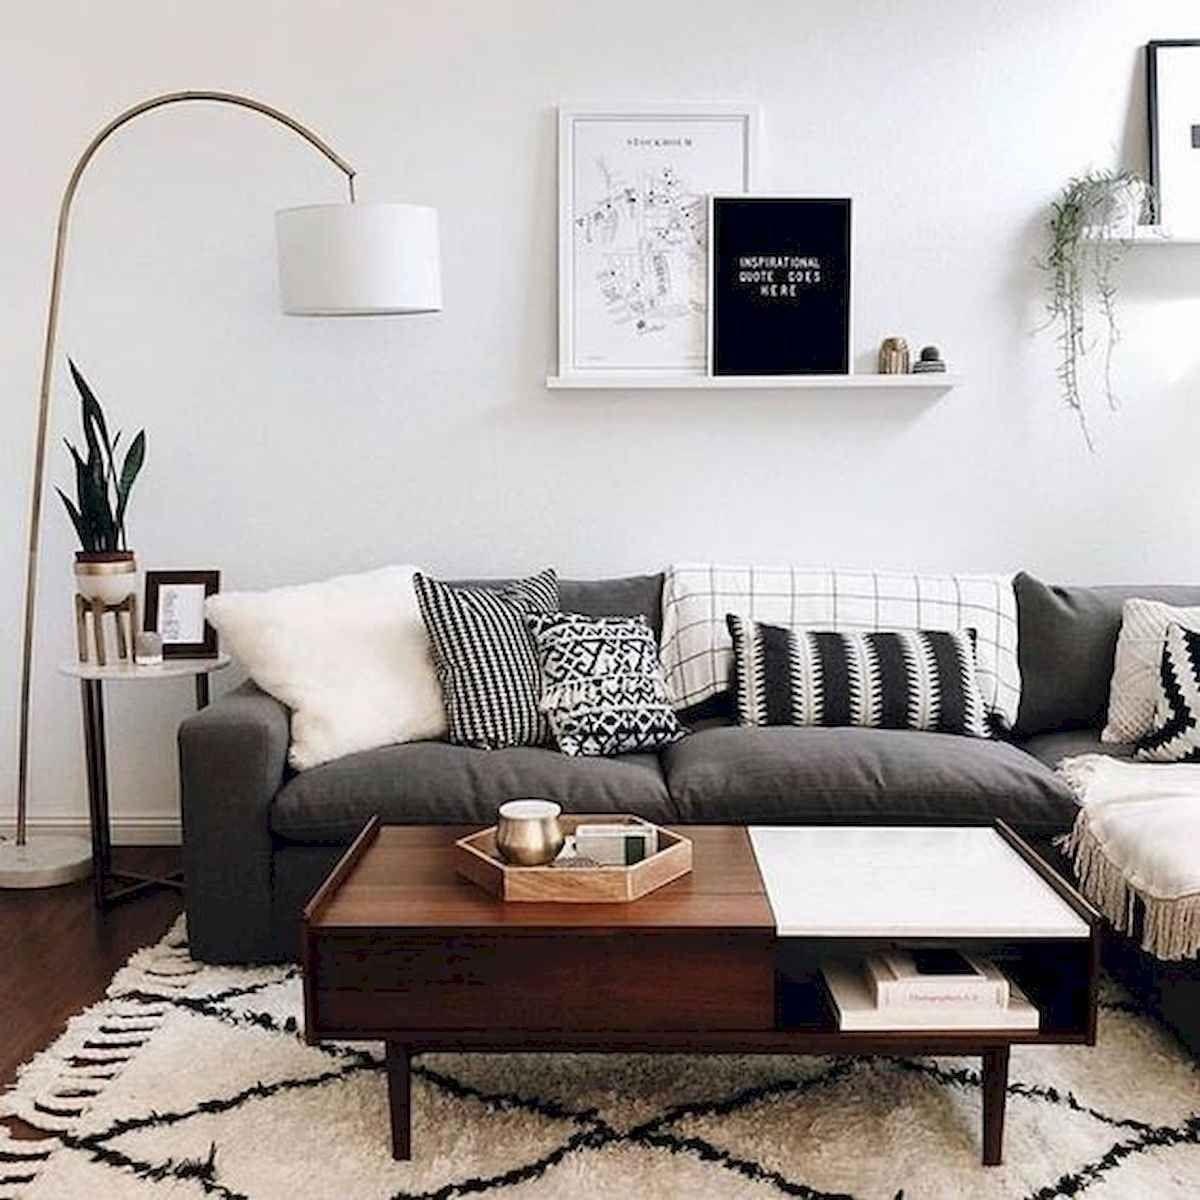 70 stunning grey white black living room decor ideas and